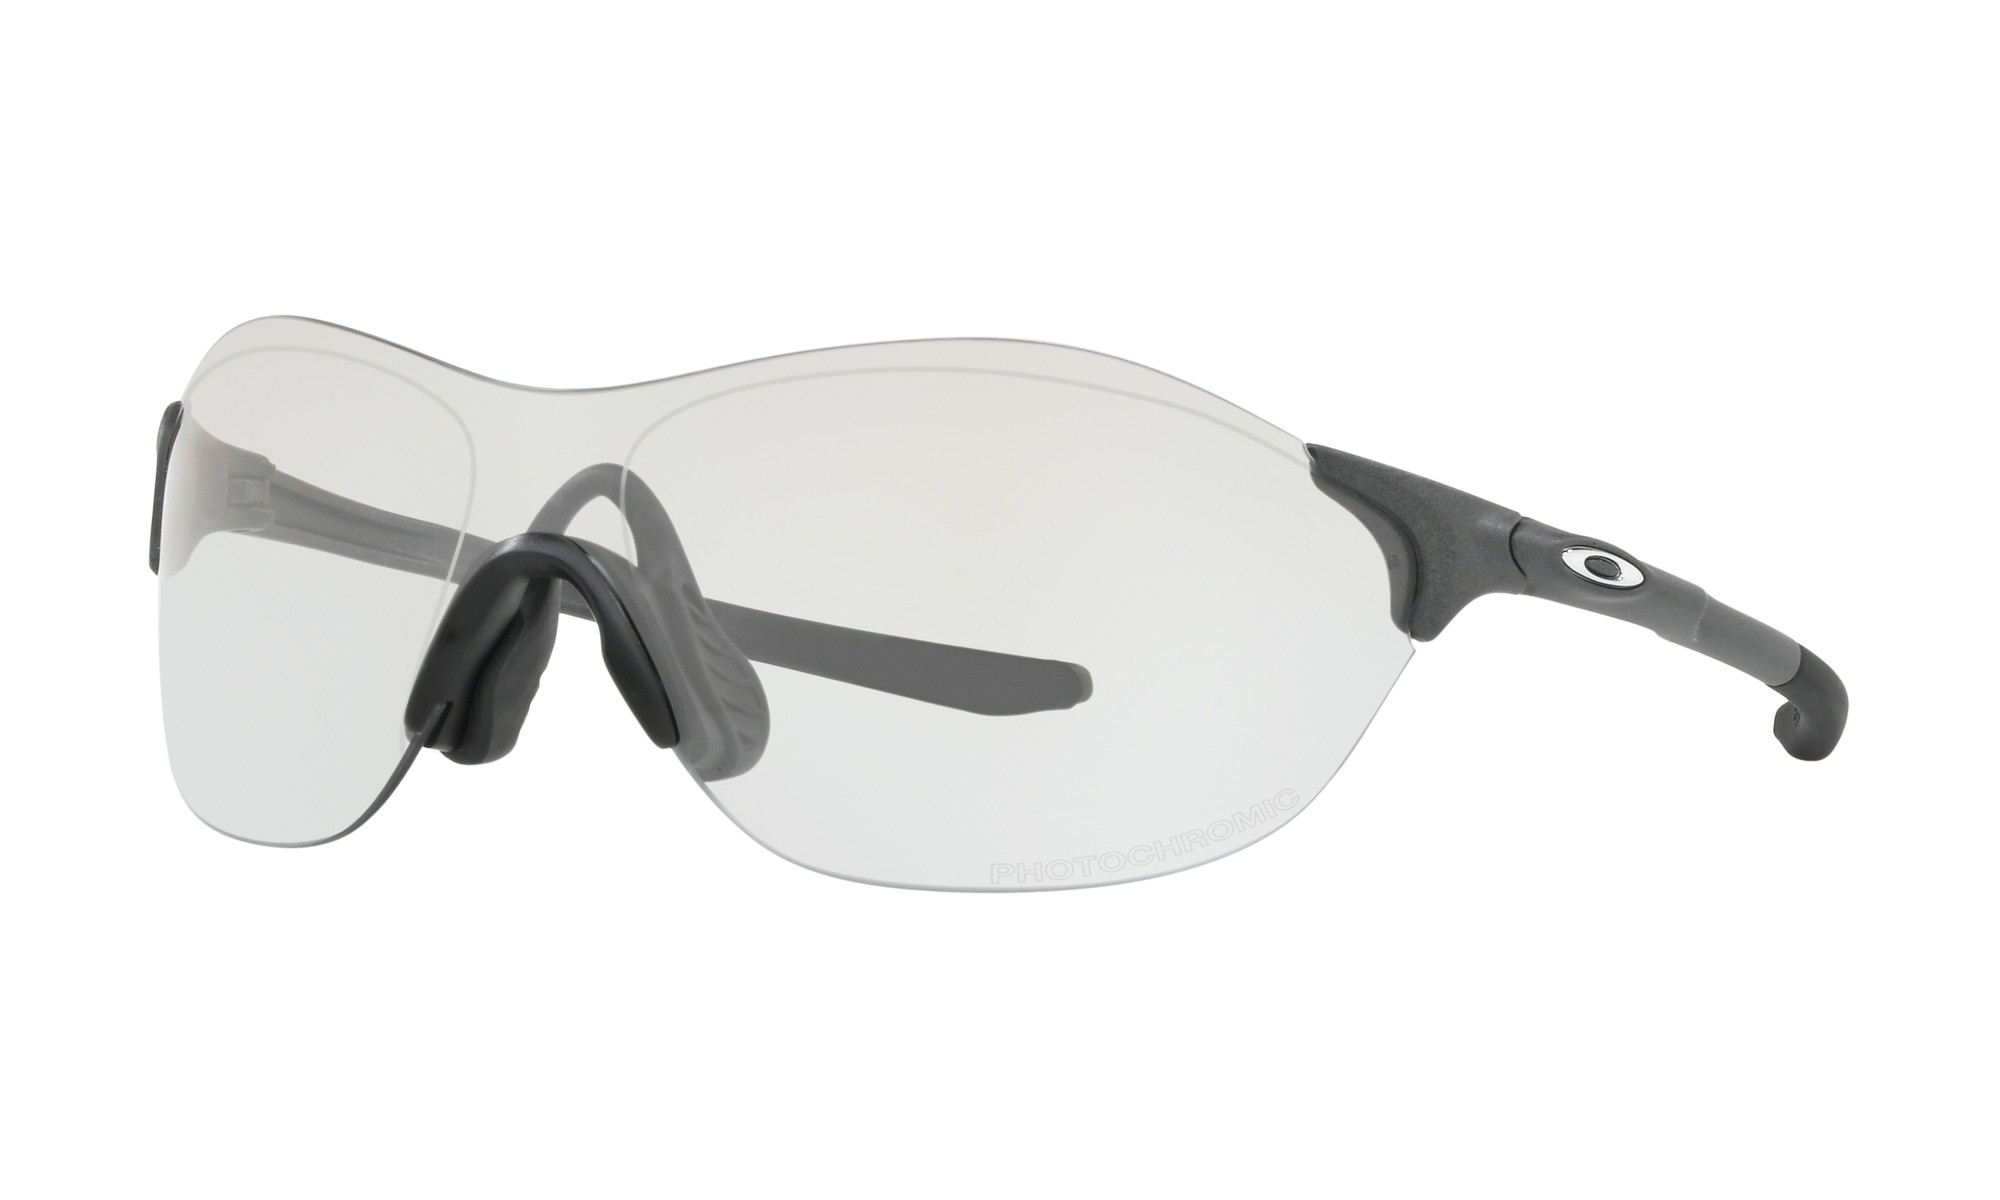 UK Knockoff Oakley Sunglasses EVZERO SWIFT PHOTOCHROMIC ASIA FIT ...